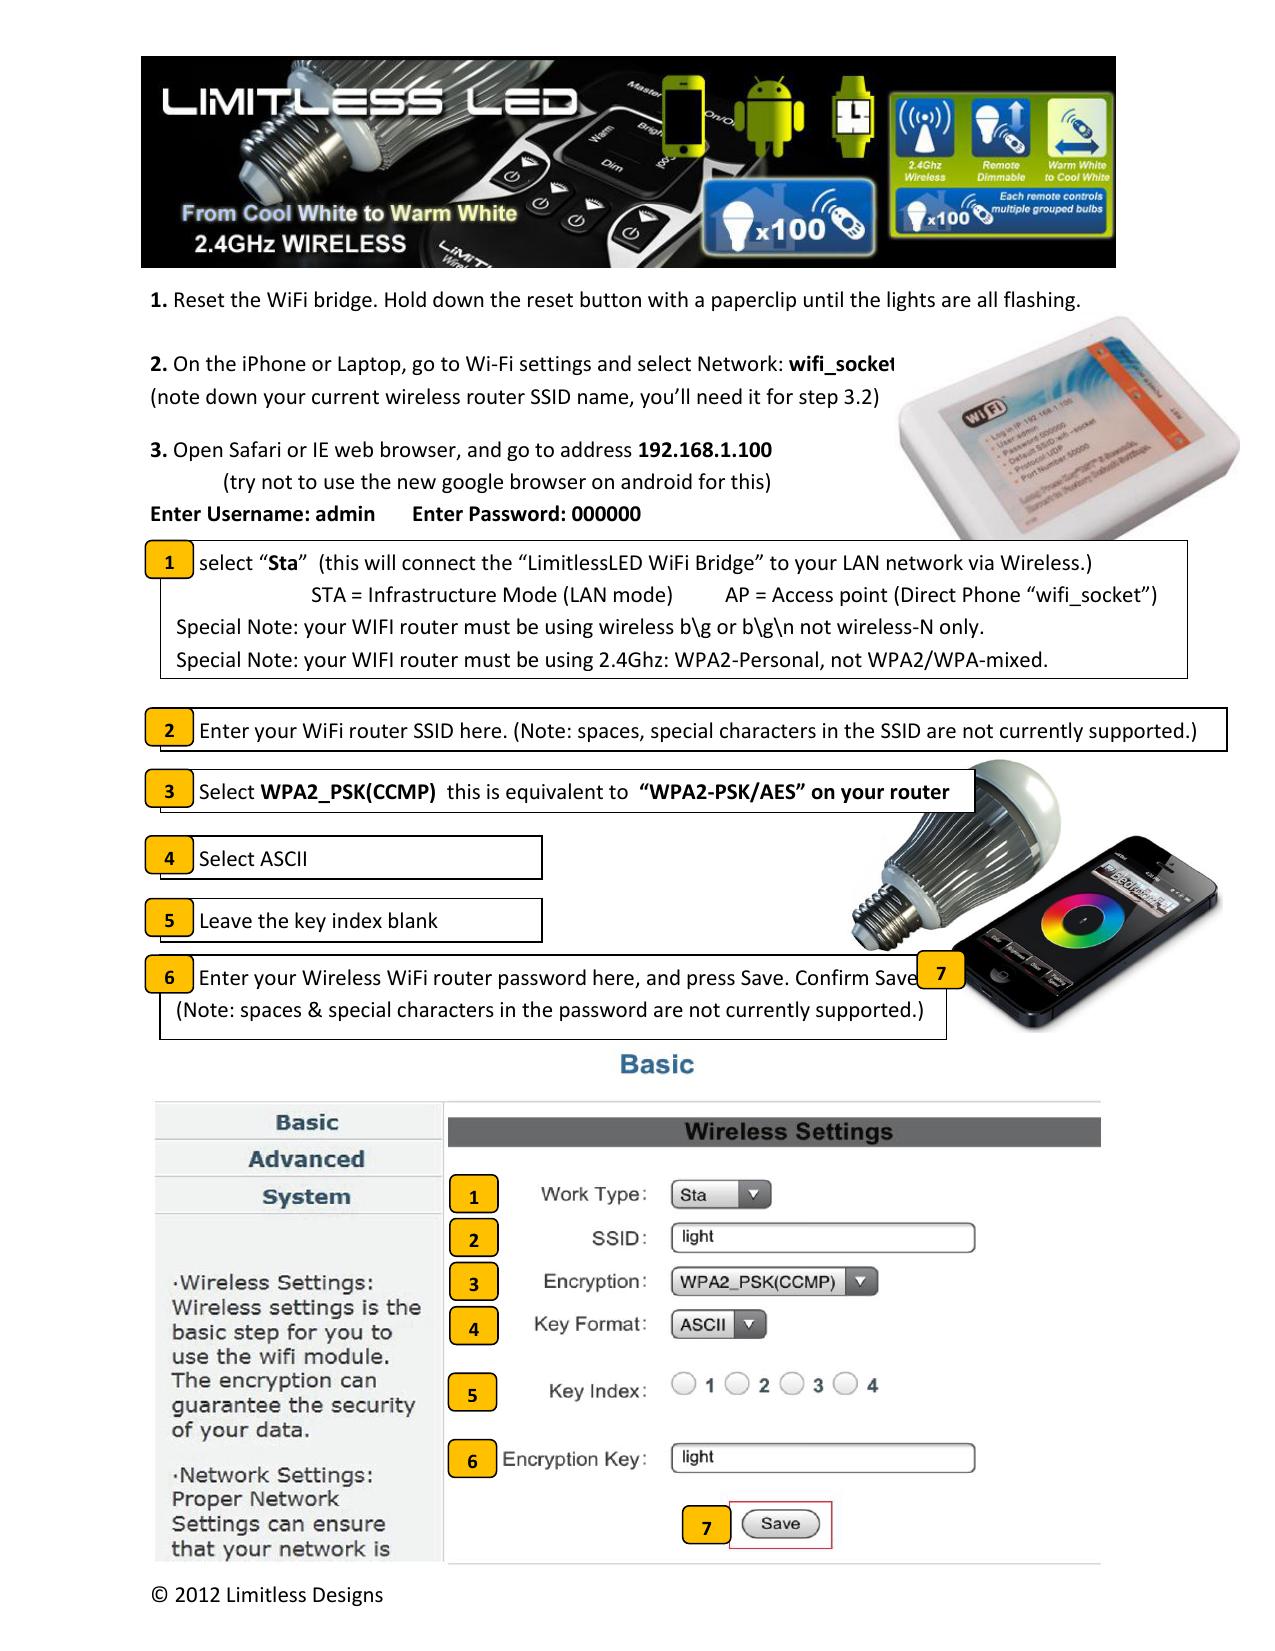 2012 Limitless Designs 1  Reset the WiFi bridge   manualzz com